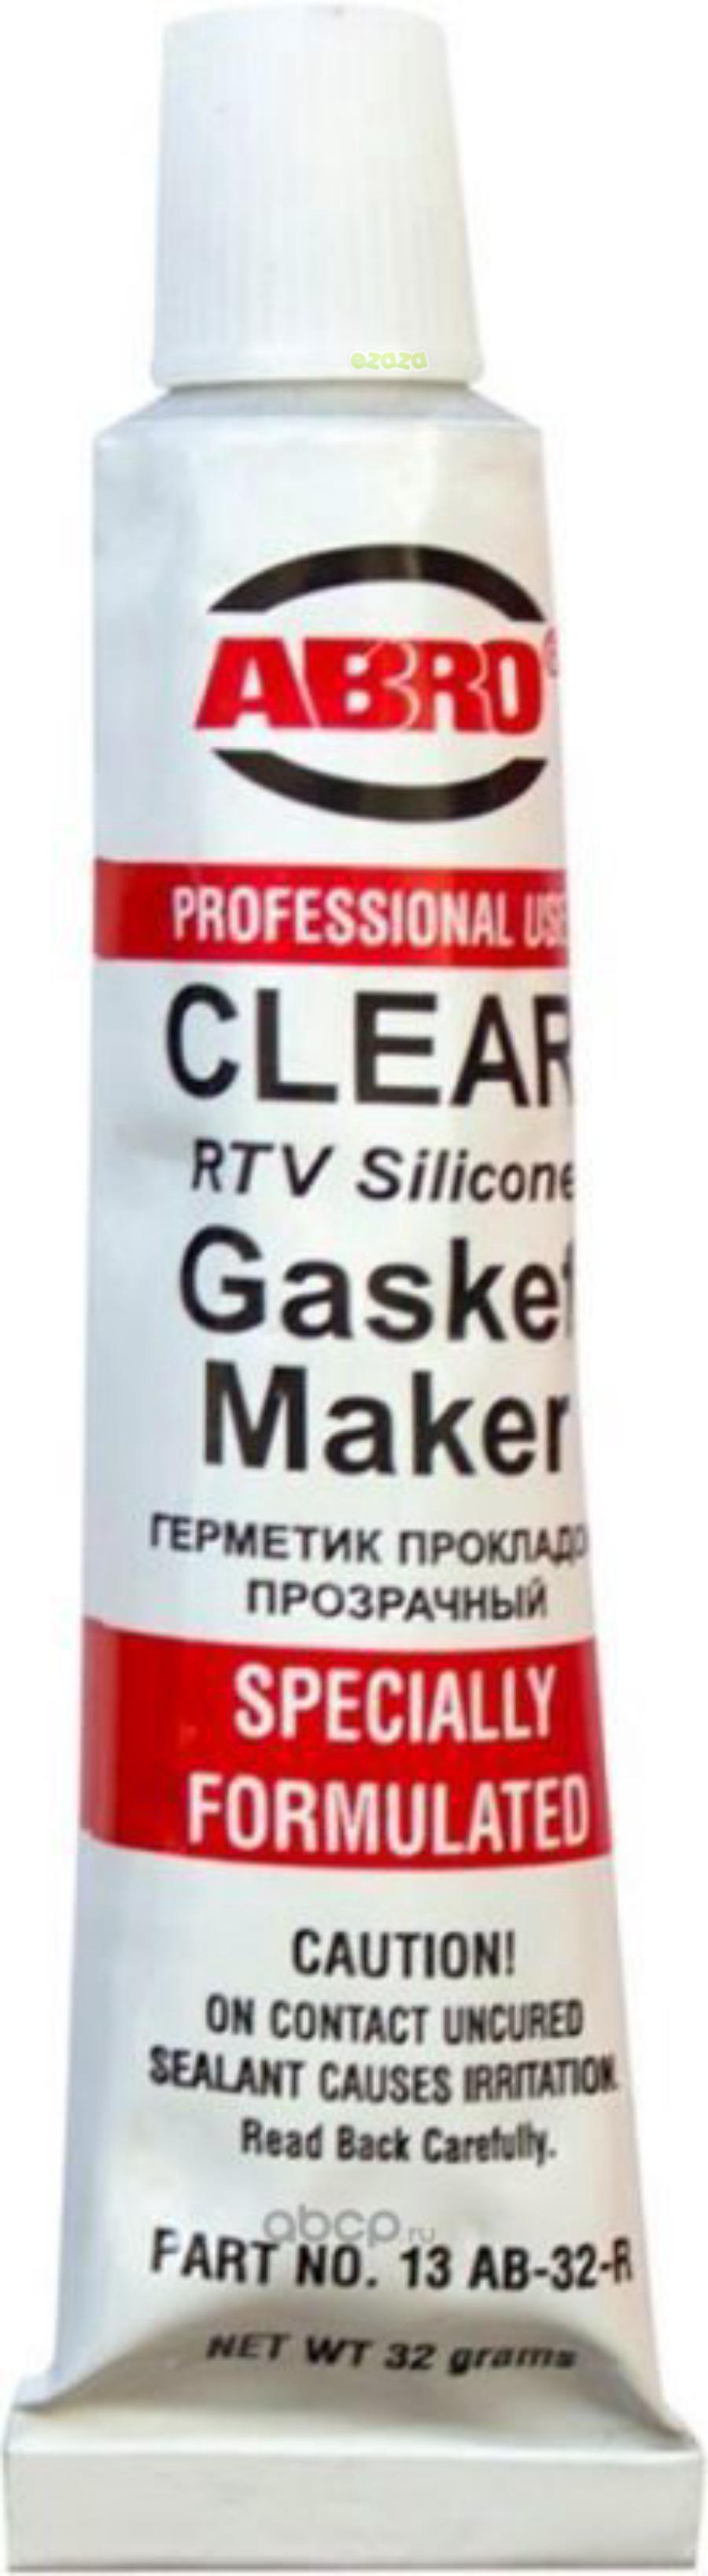 Герметик прокладок стандартный, прозрачный, 32гр